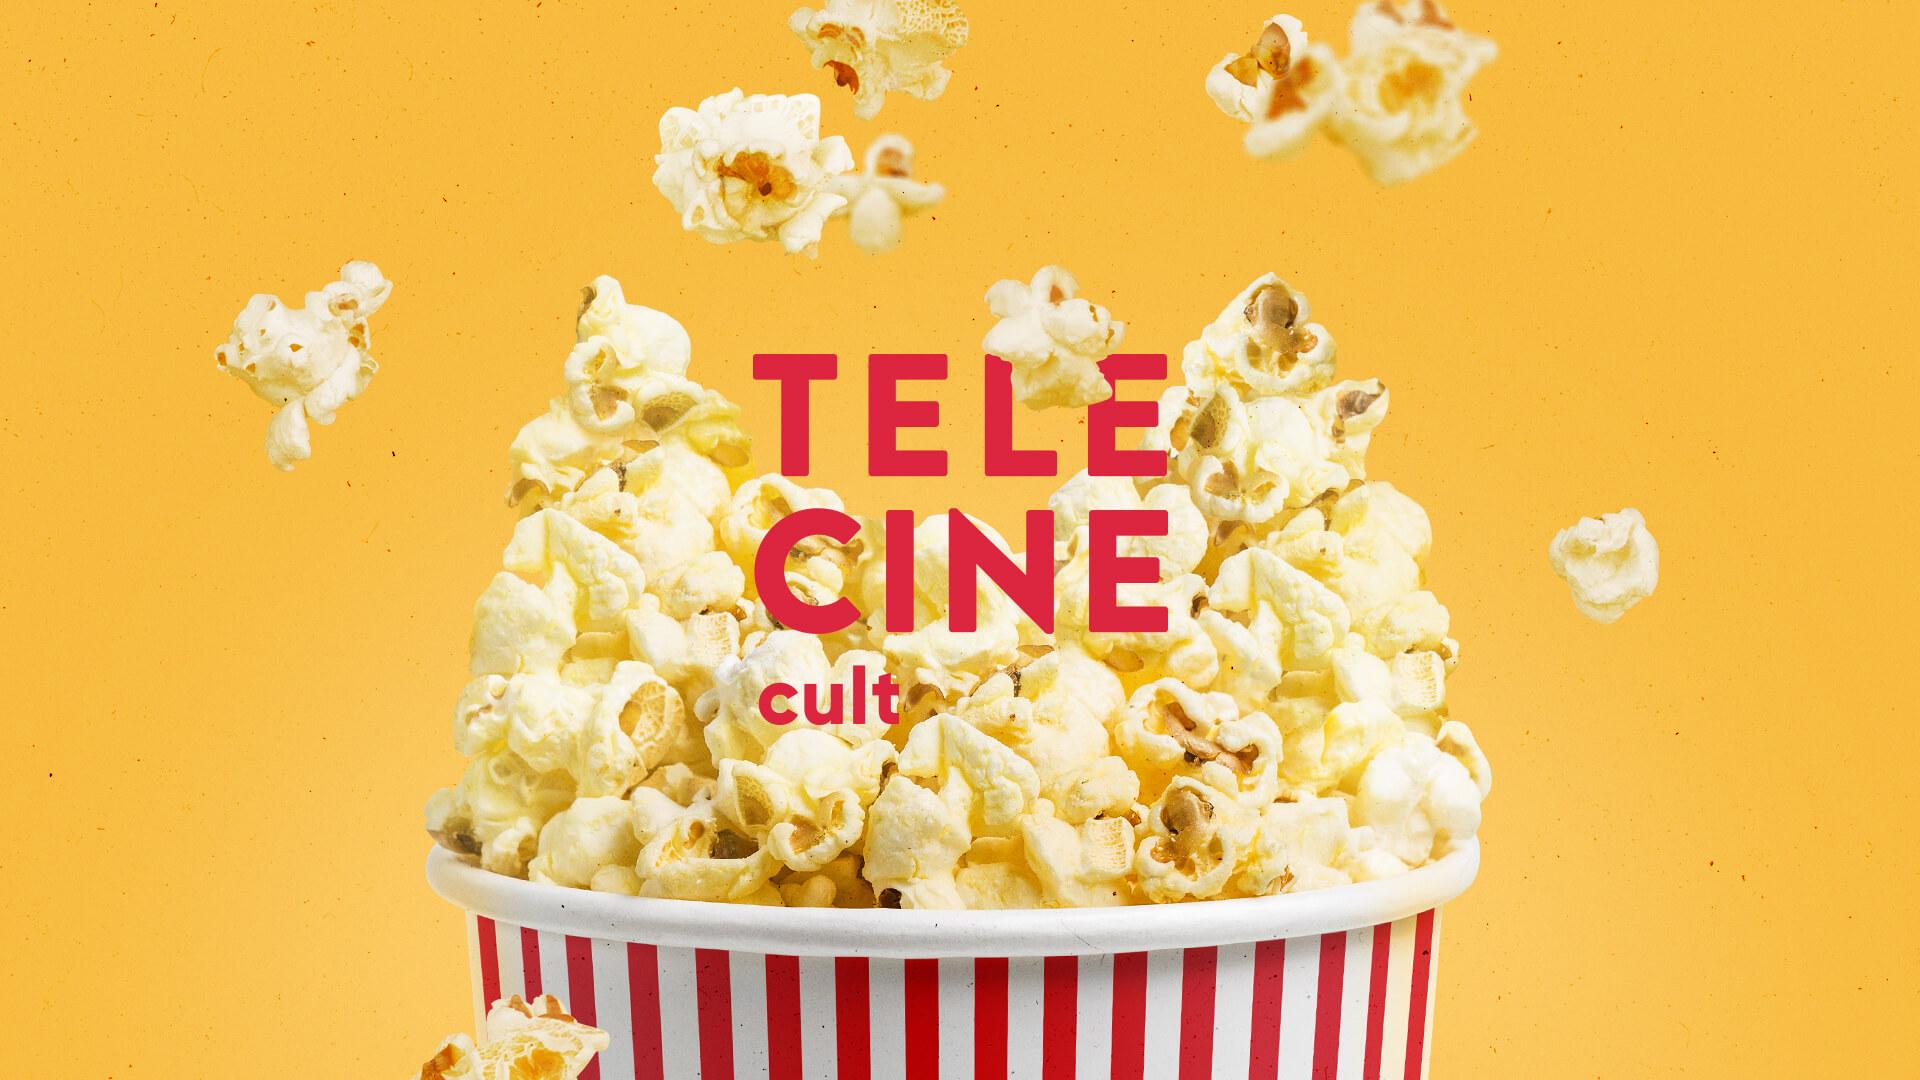 Telecine Cult